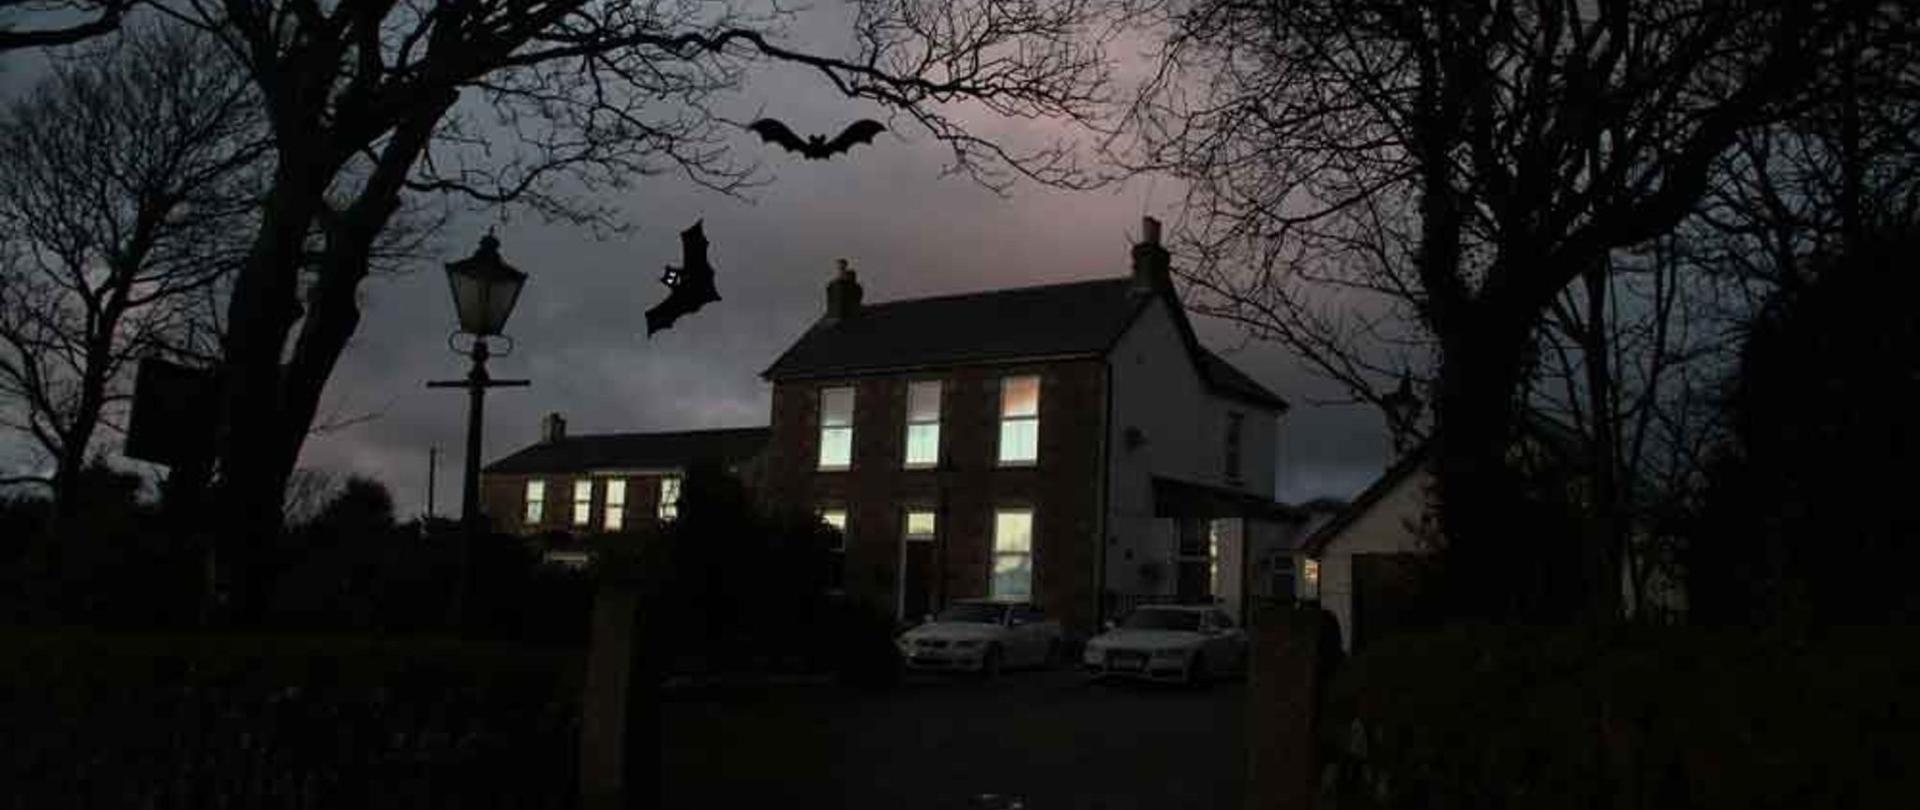 house pic last pgae.jpg